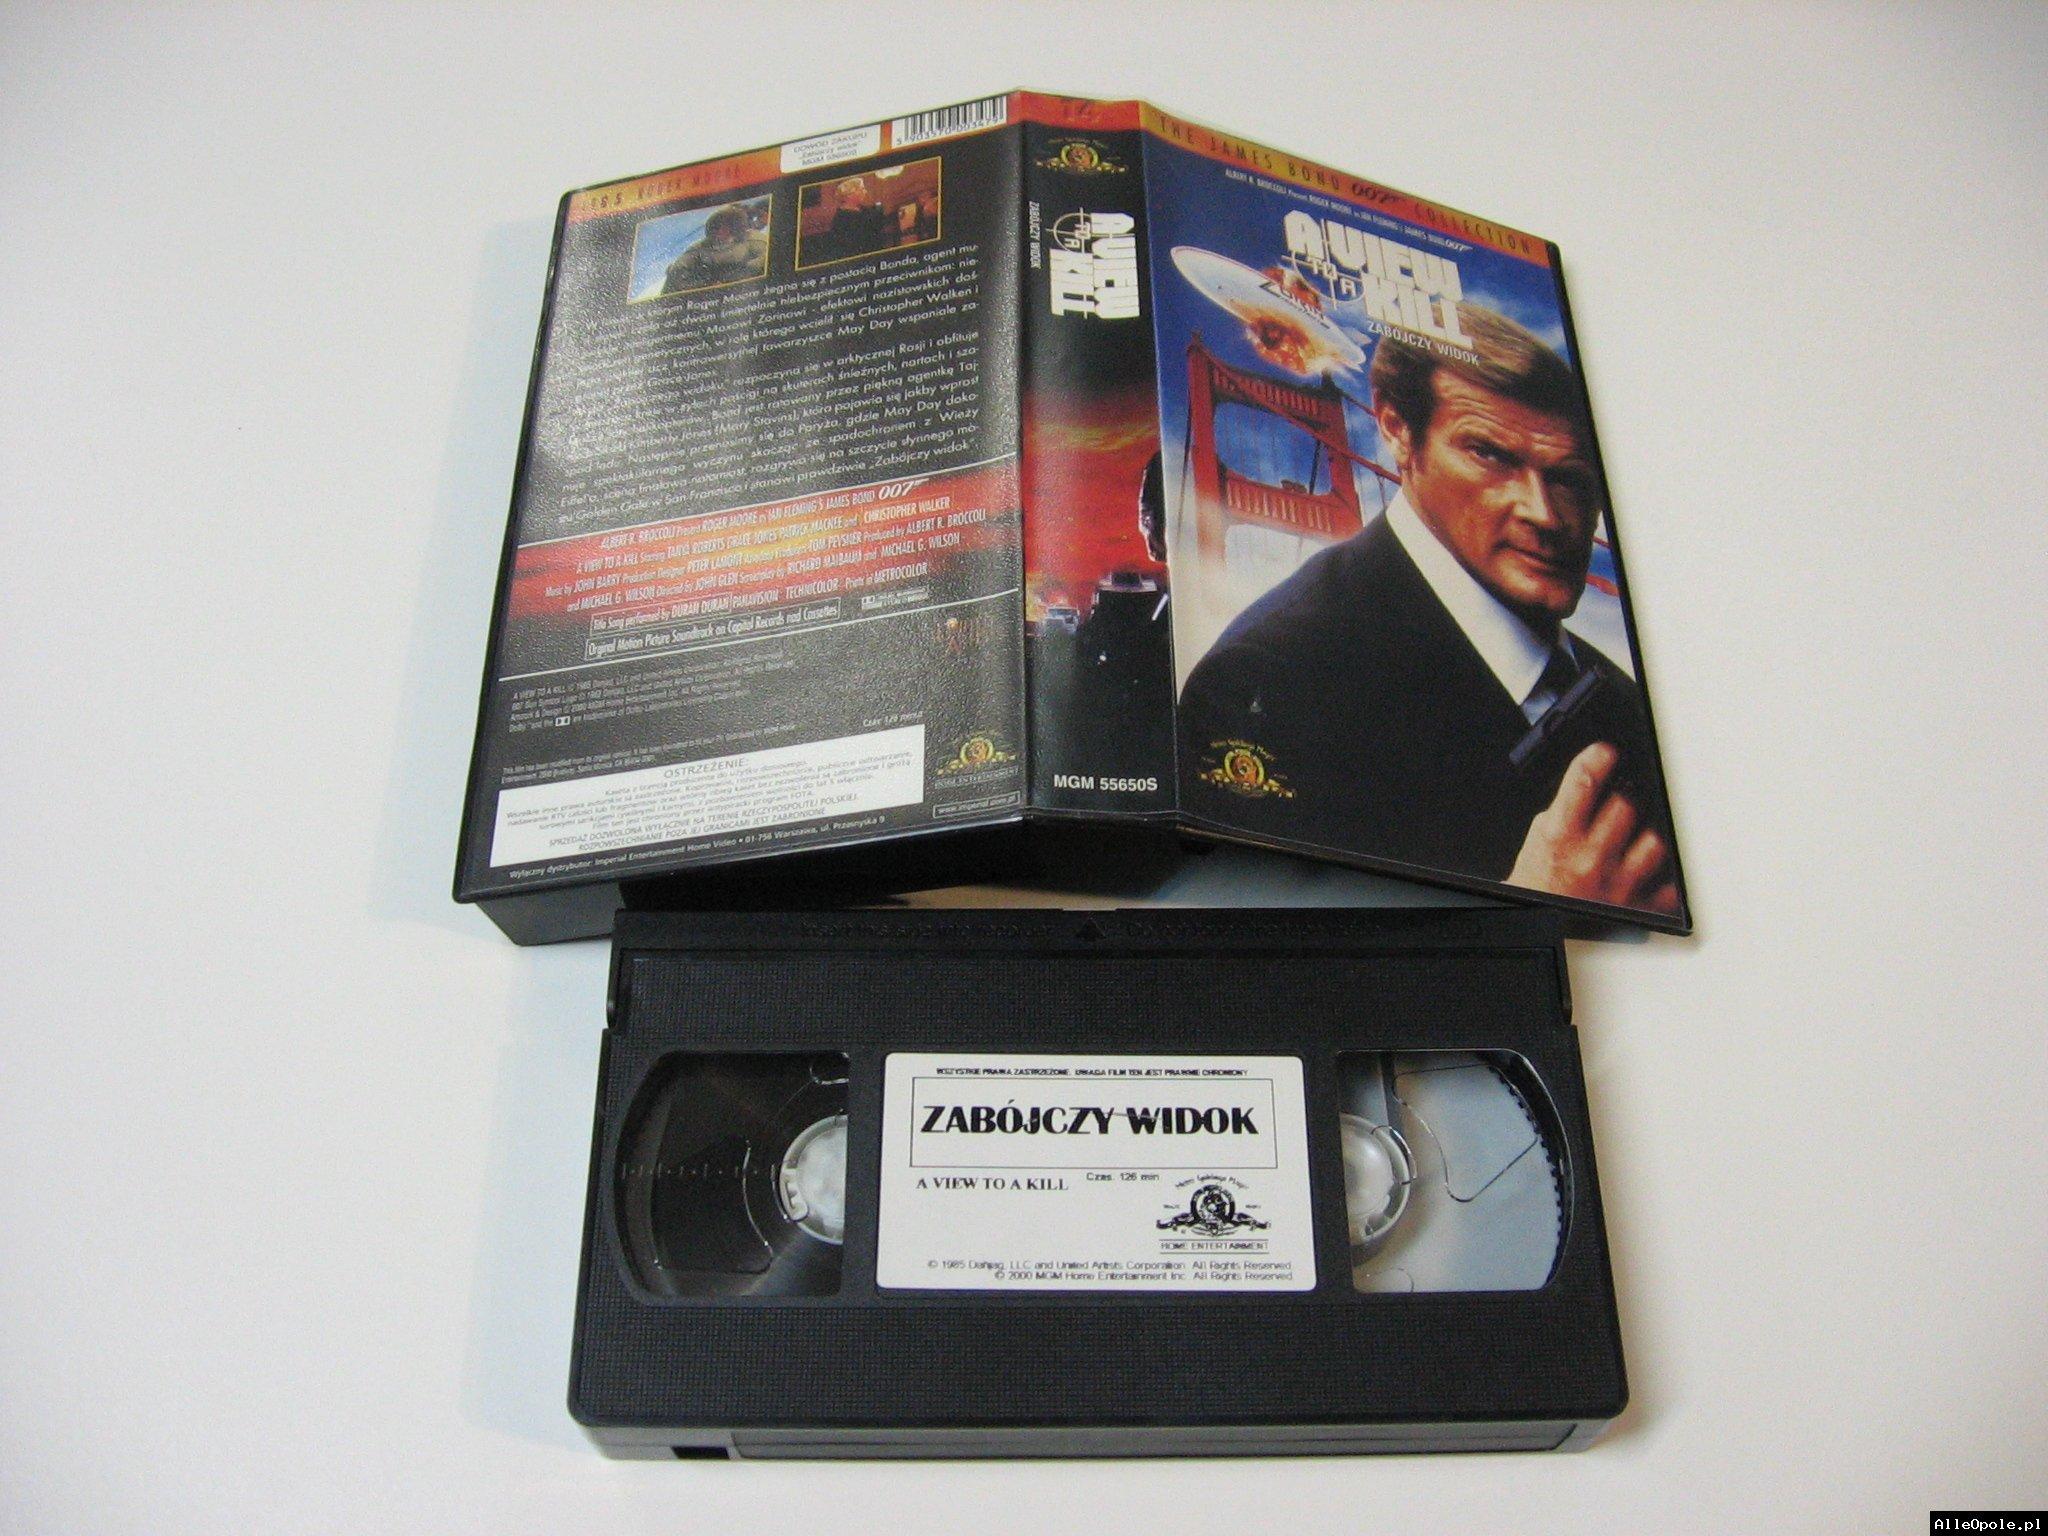 007 ZABÓJCZY WIDOK - VHS Kaseta Video - Opole 1733